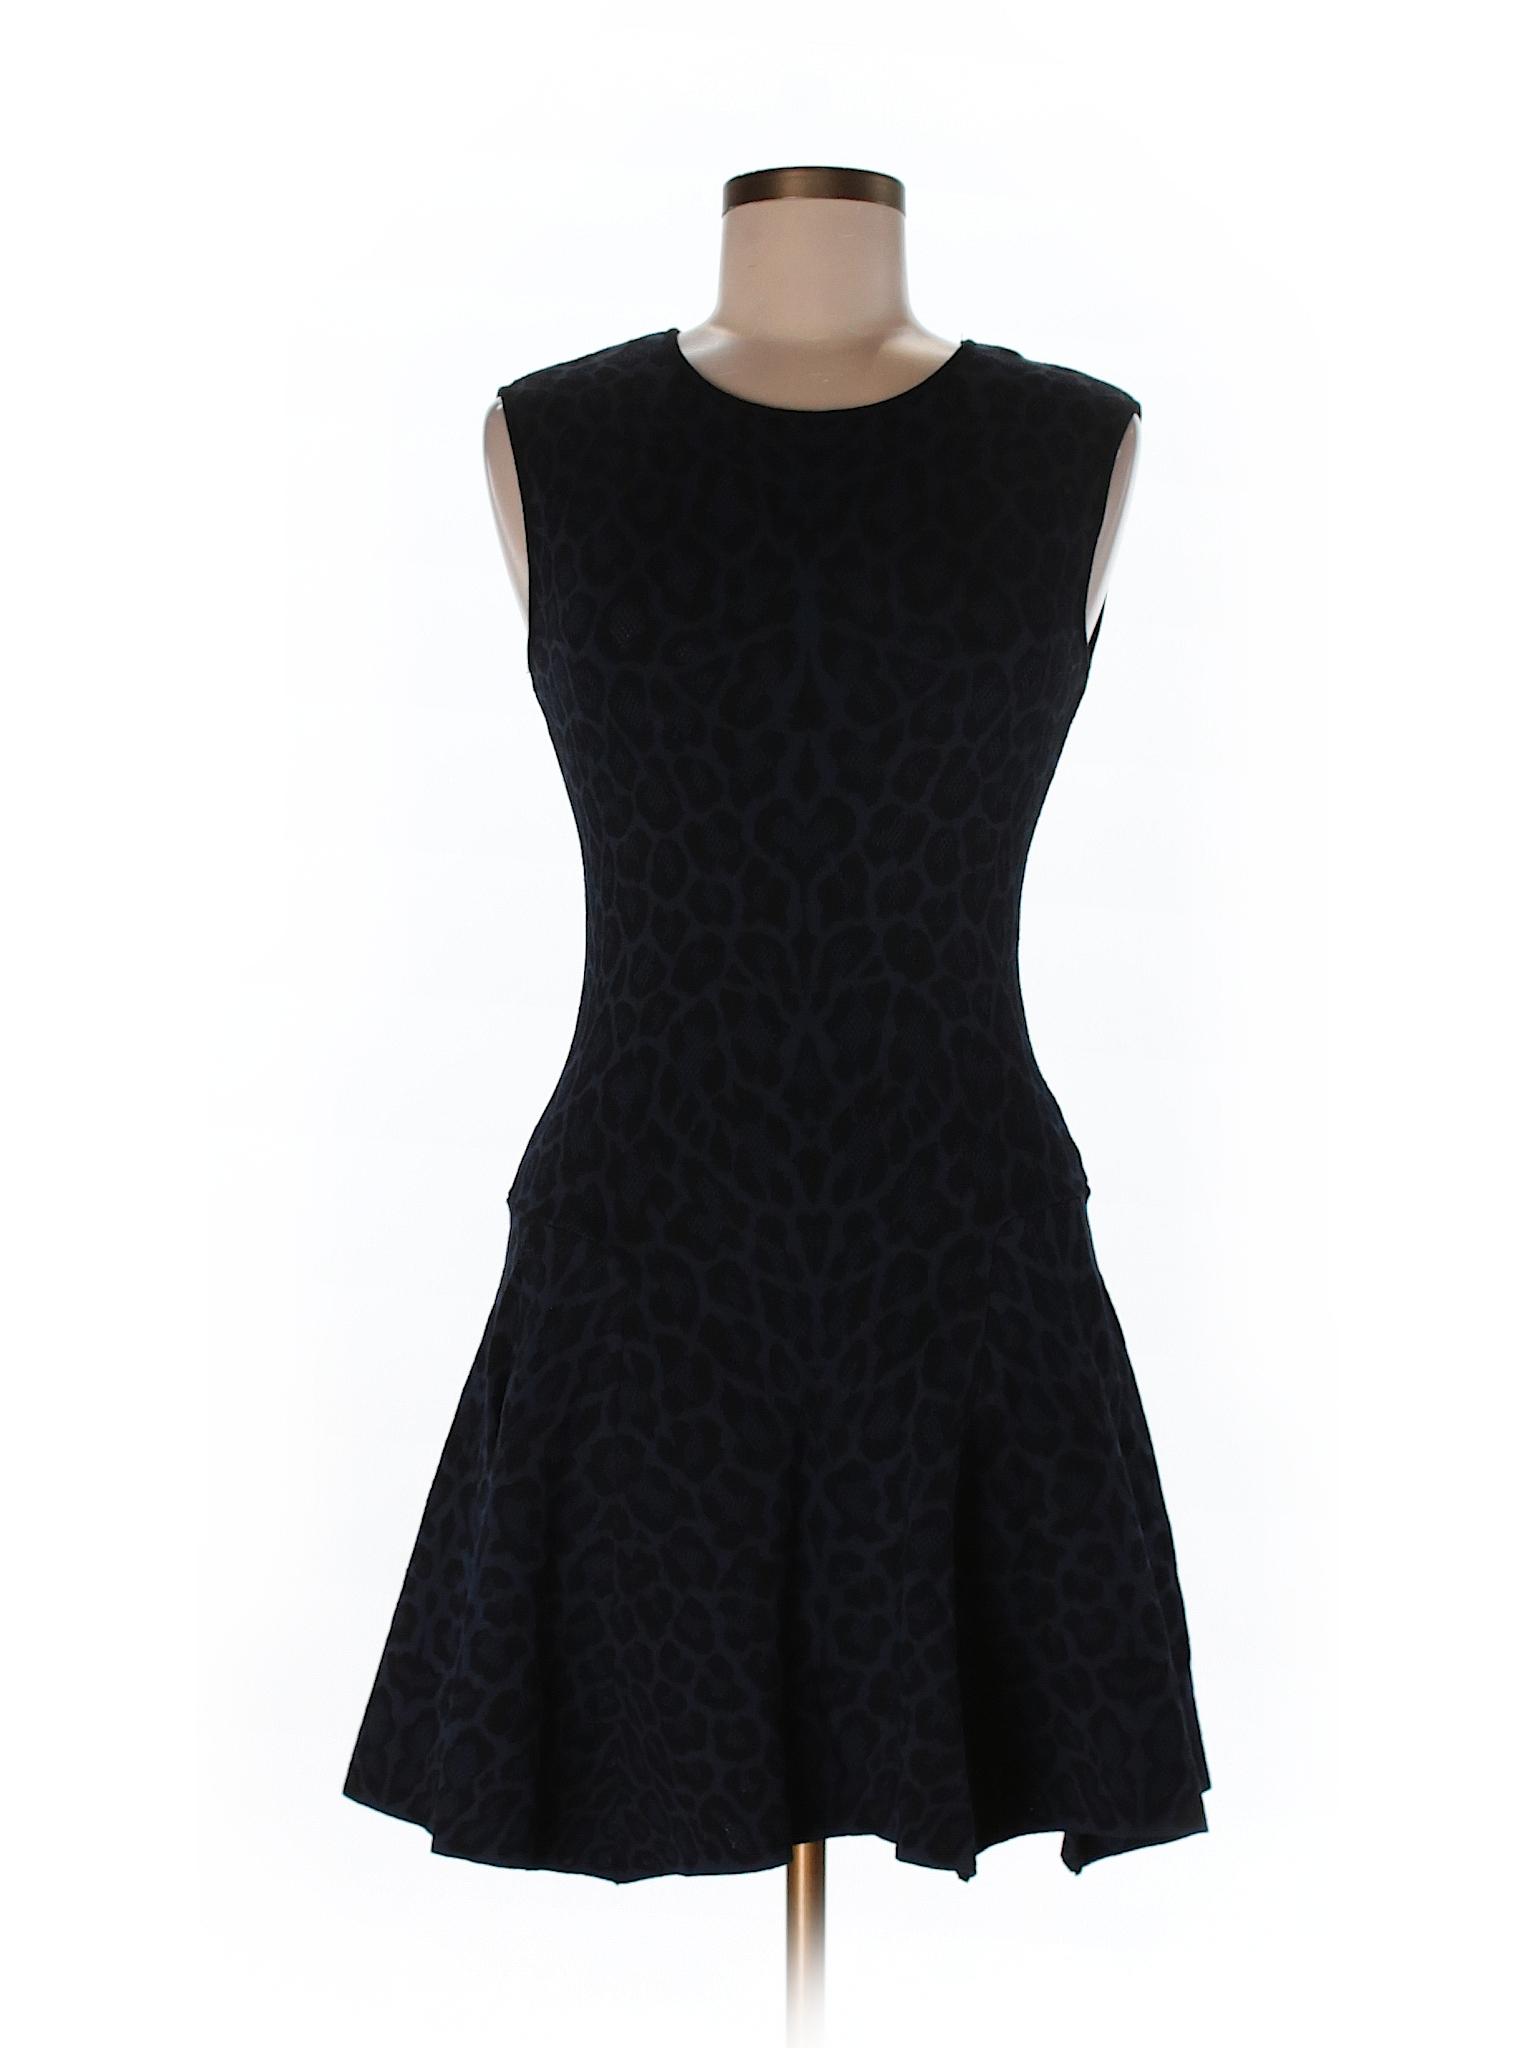 RVN Casual Selling Selling Dress RVN PZqOYwz